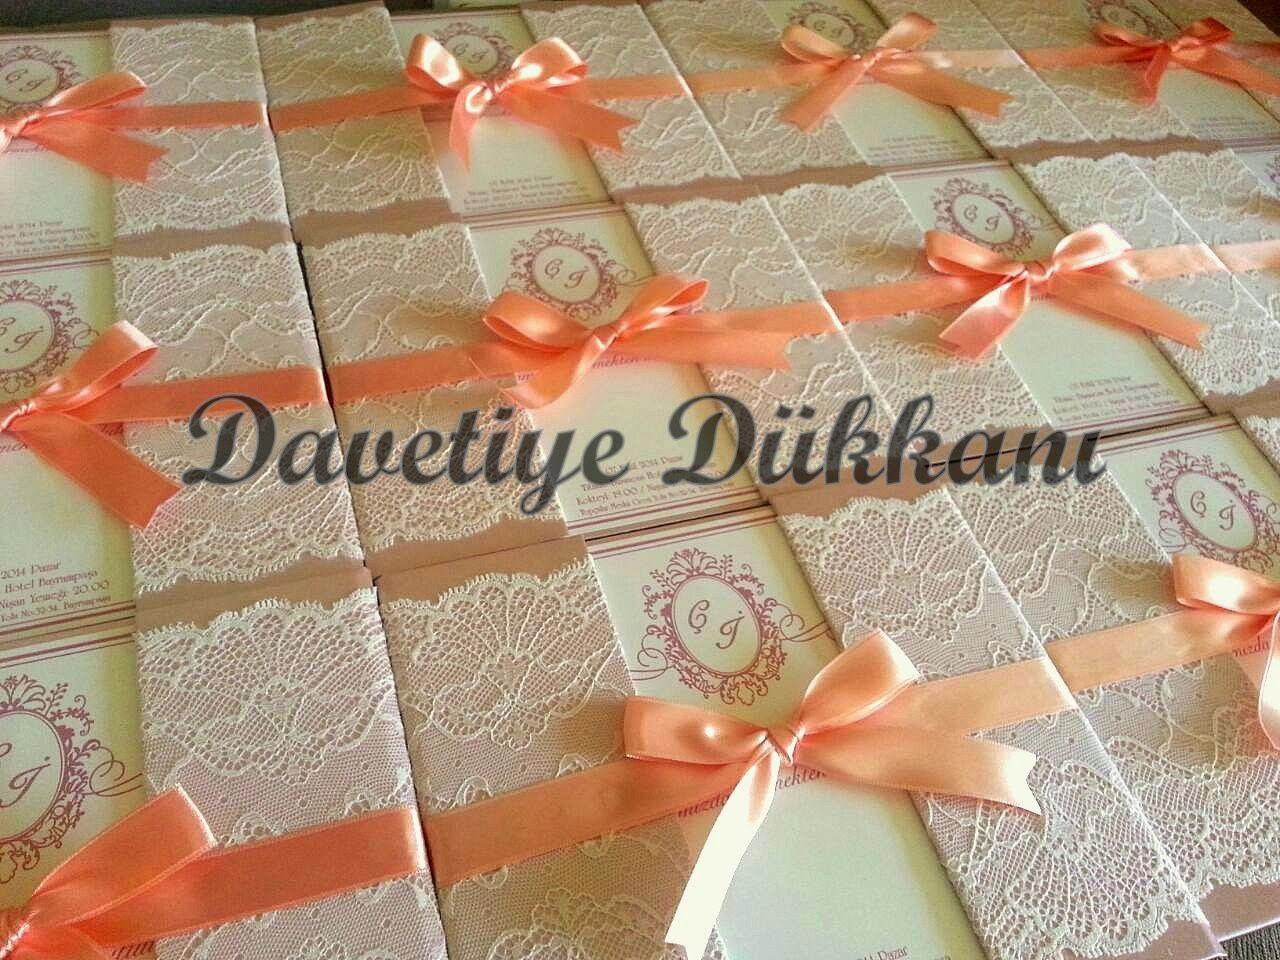 http://www.davetiye-dukkani.com/tr/product/alberta-davetiye-3470.htm